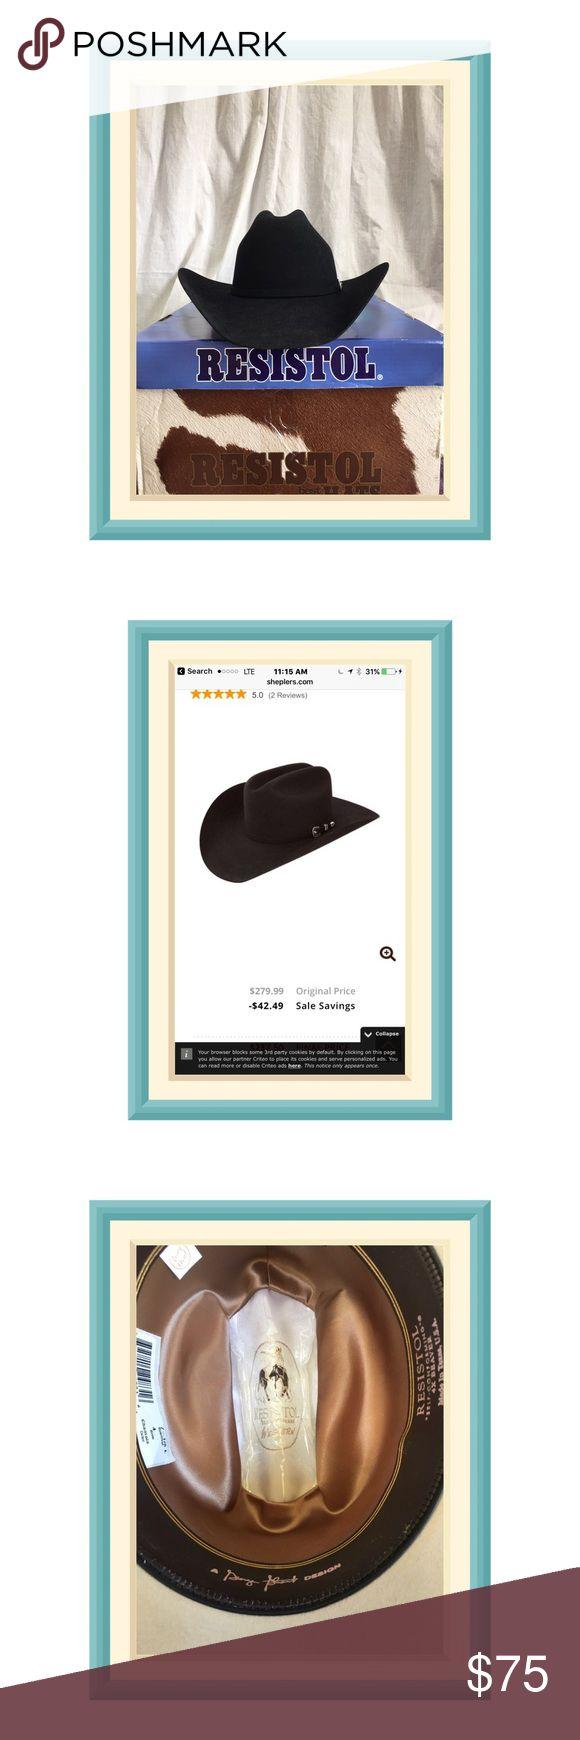 RESISTOL 6x beaver Black Cowboy Hat Beautiful, self-conforming 6x beaver RESISTOL Cowboy Hat EUC RESISTOL  Accessories Hats